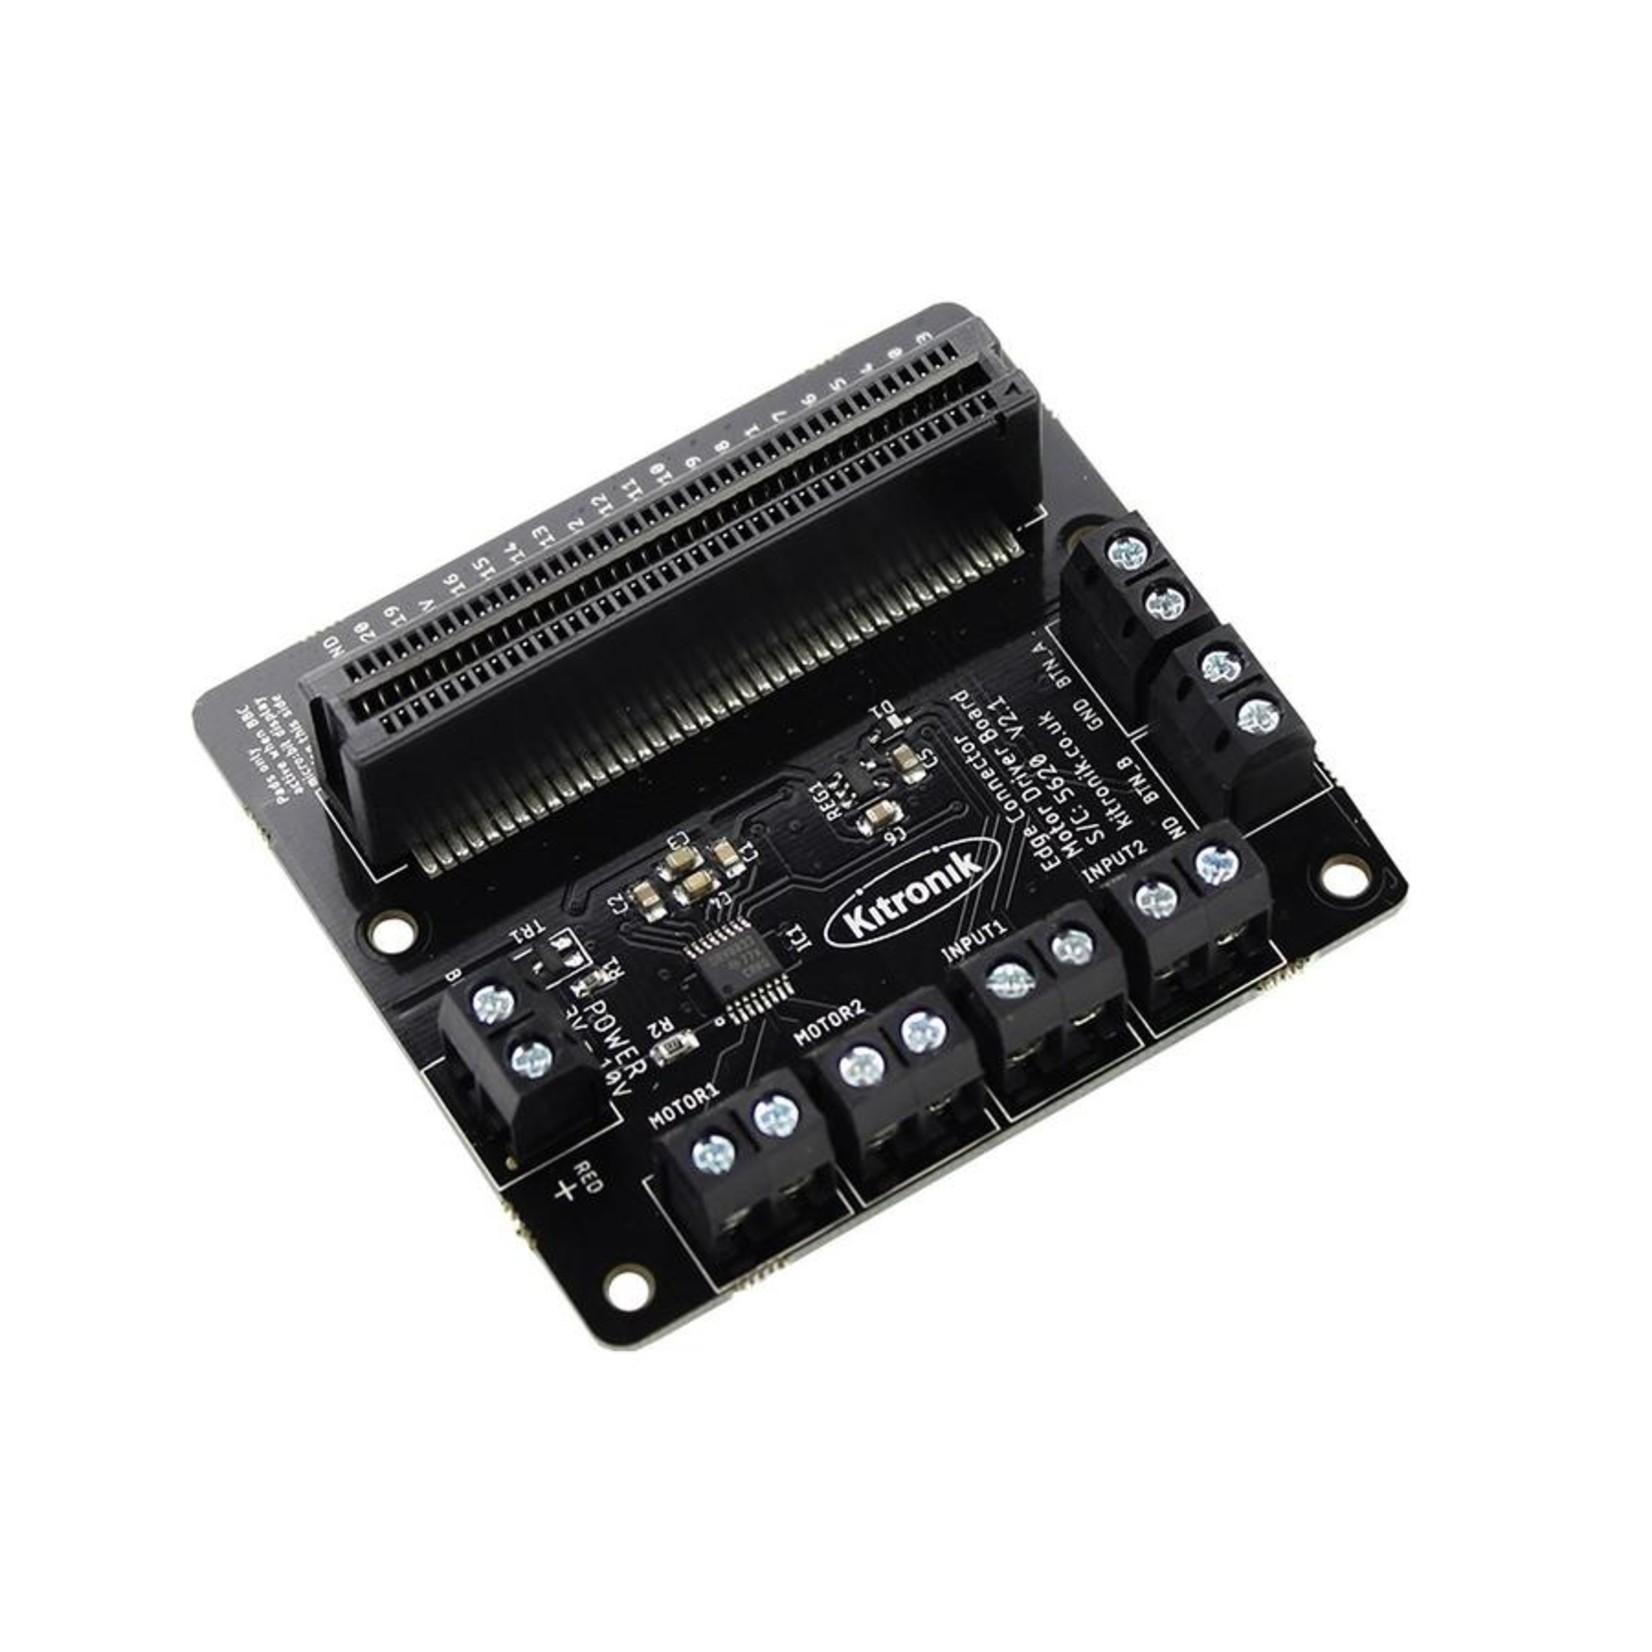 Kitronik Motor Driver Board V2 pour le micro: bit BBC